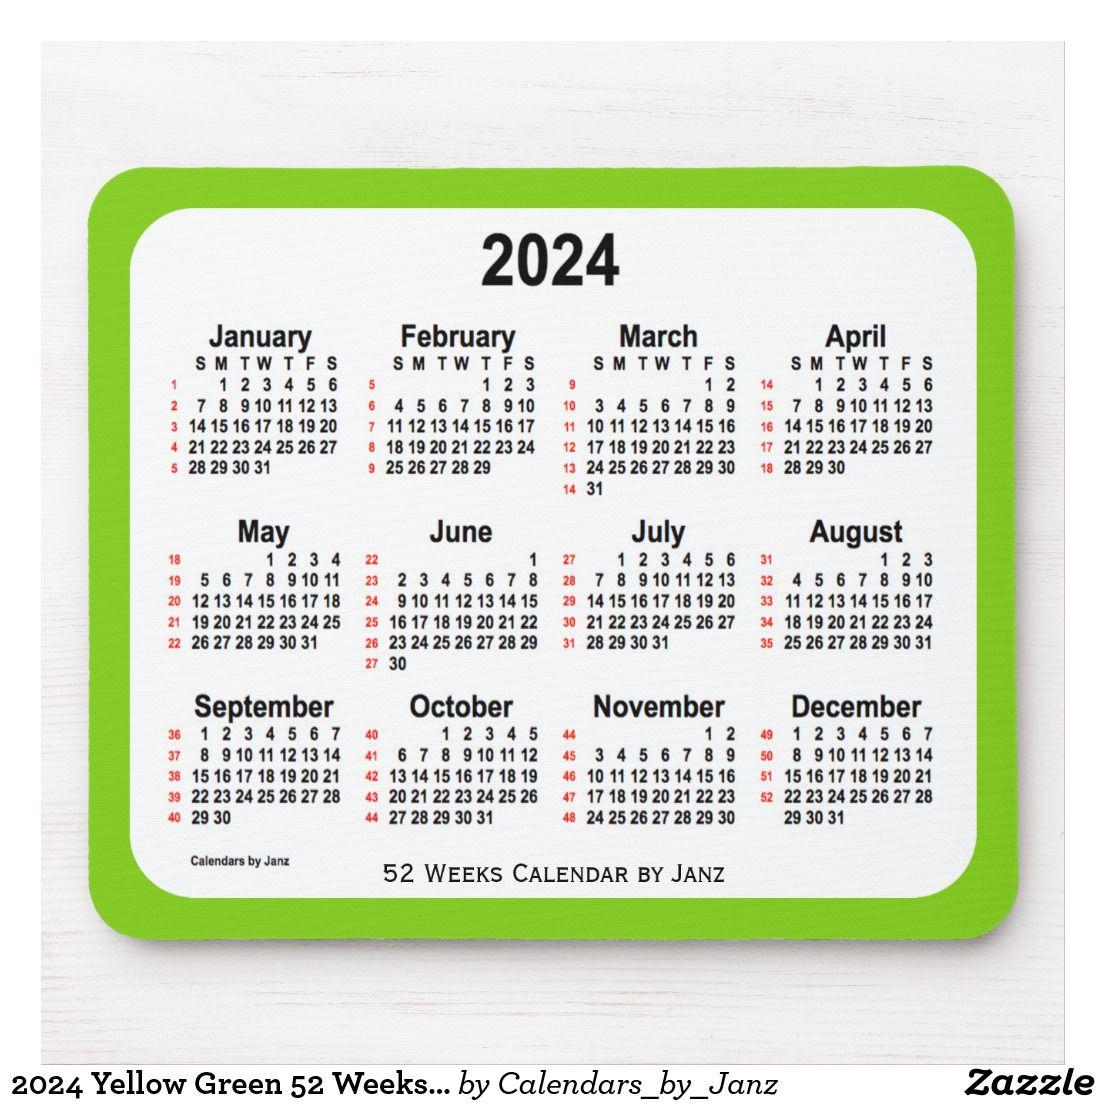 48e1b2b75a5 2024 Yellow Green 52 Weeks Calendar by Janz Mouse Pad   Zazzle.com ...